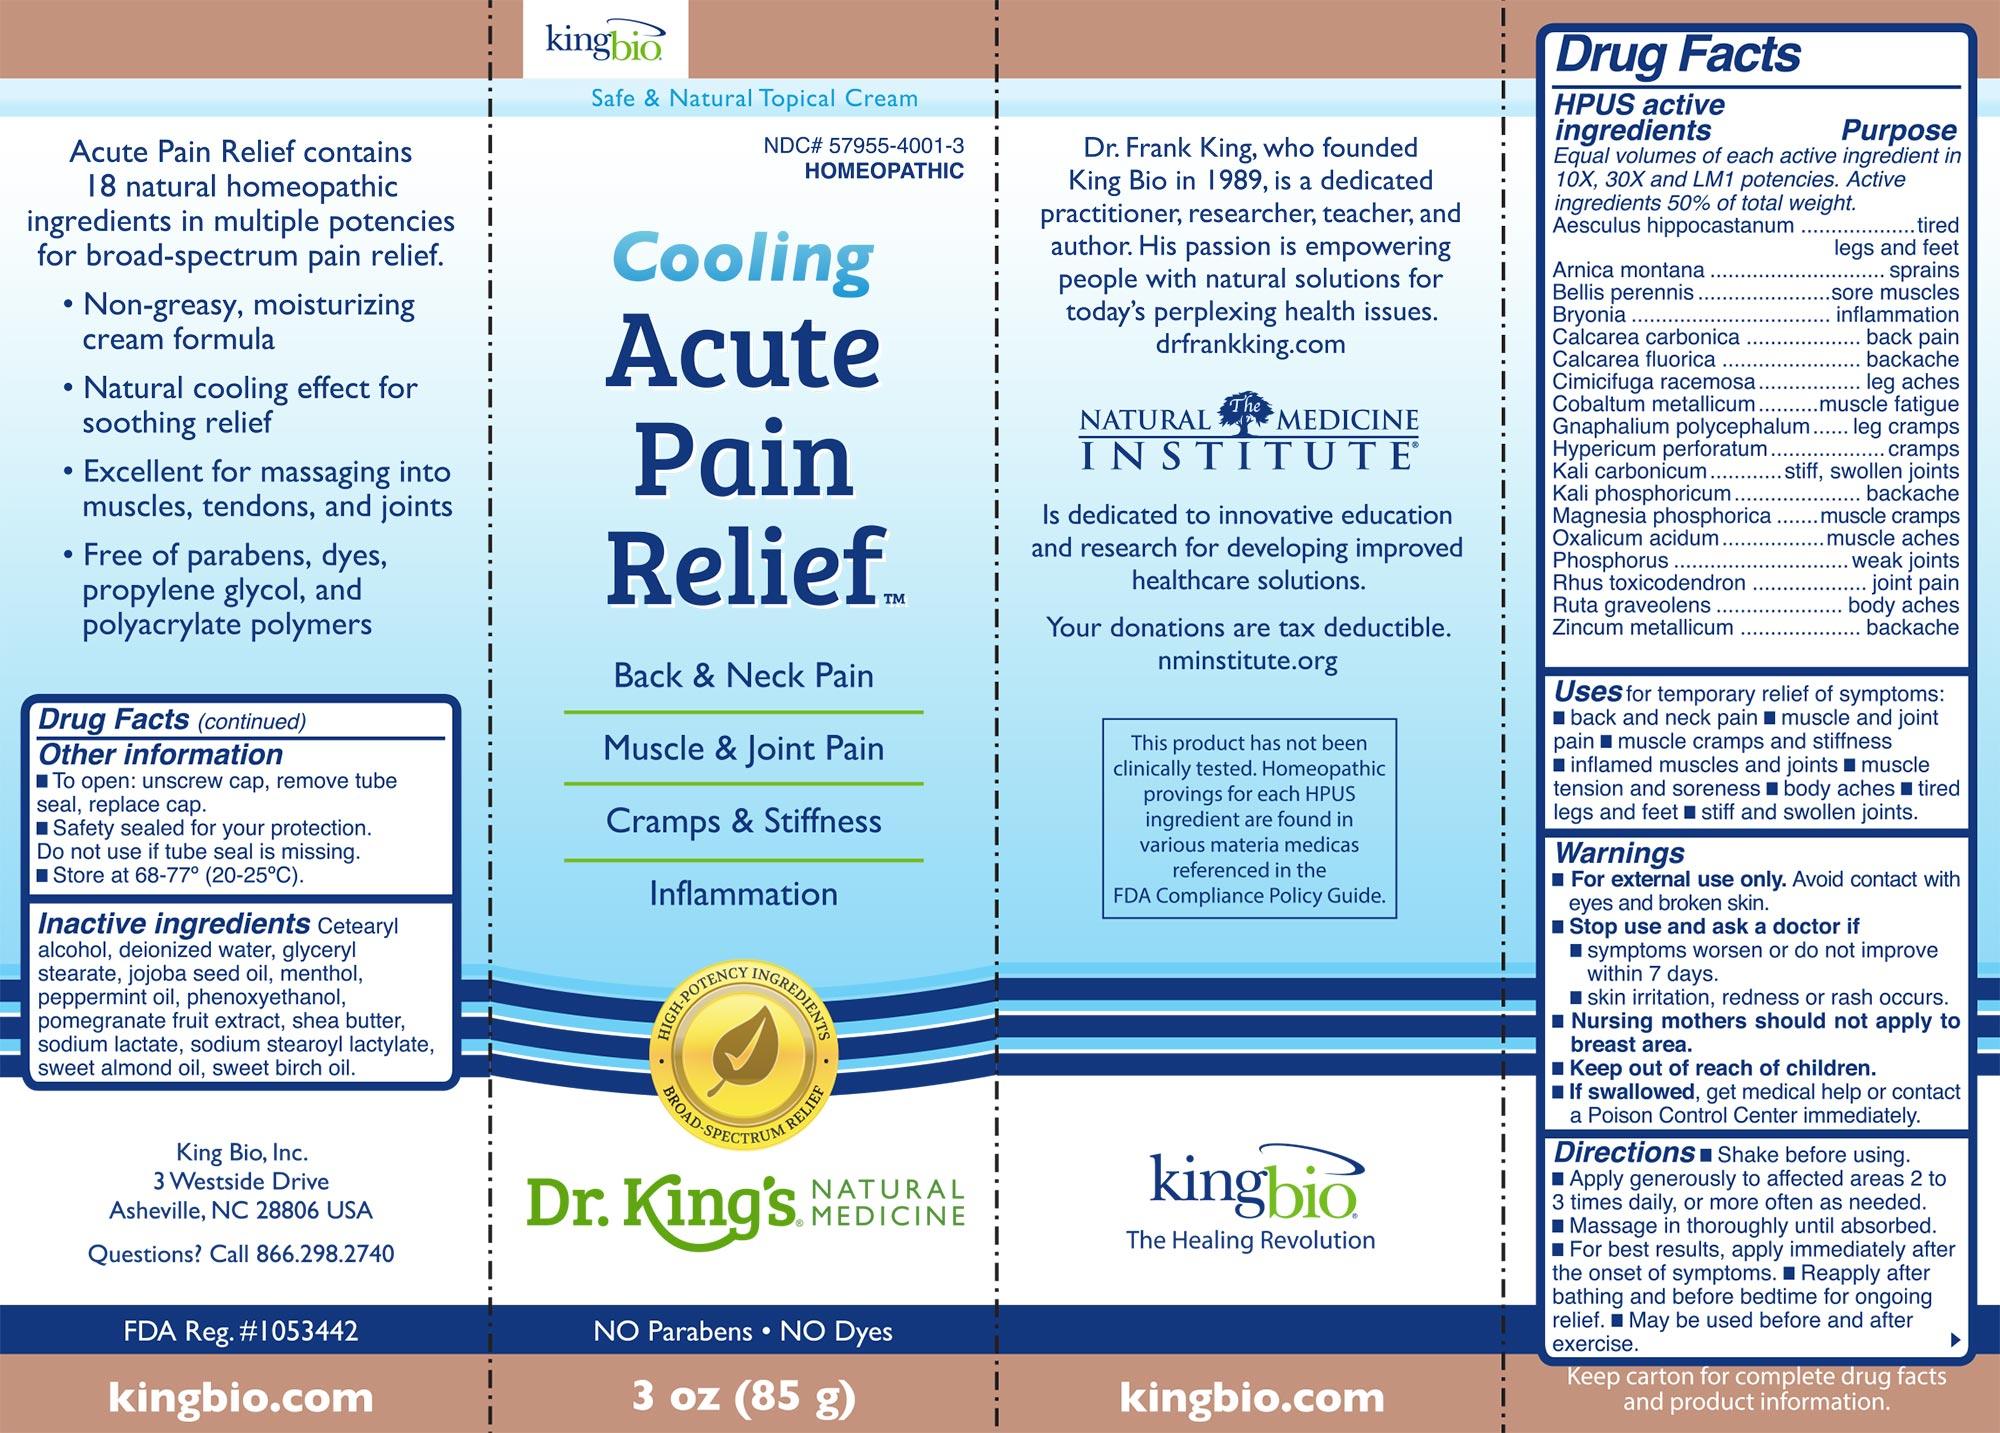 Acute Pain Relief Topical Cream